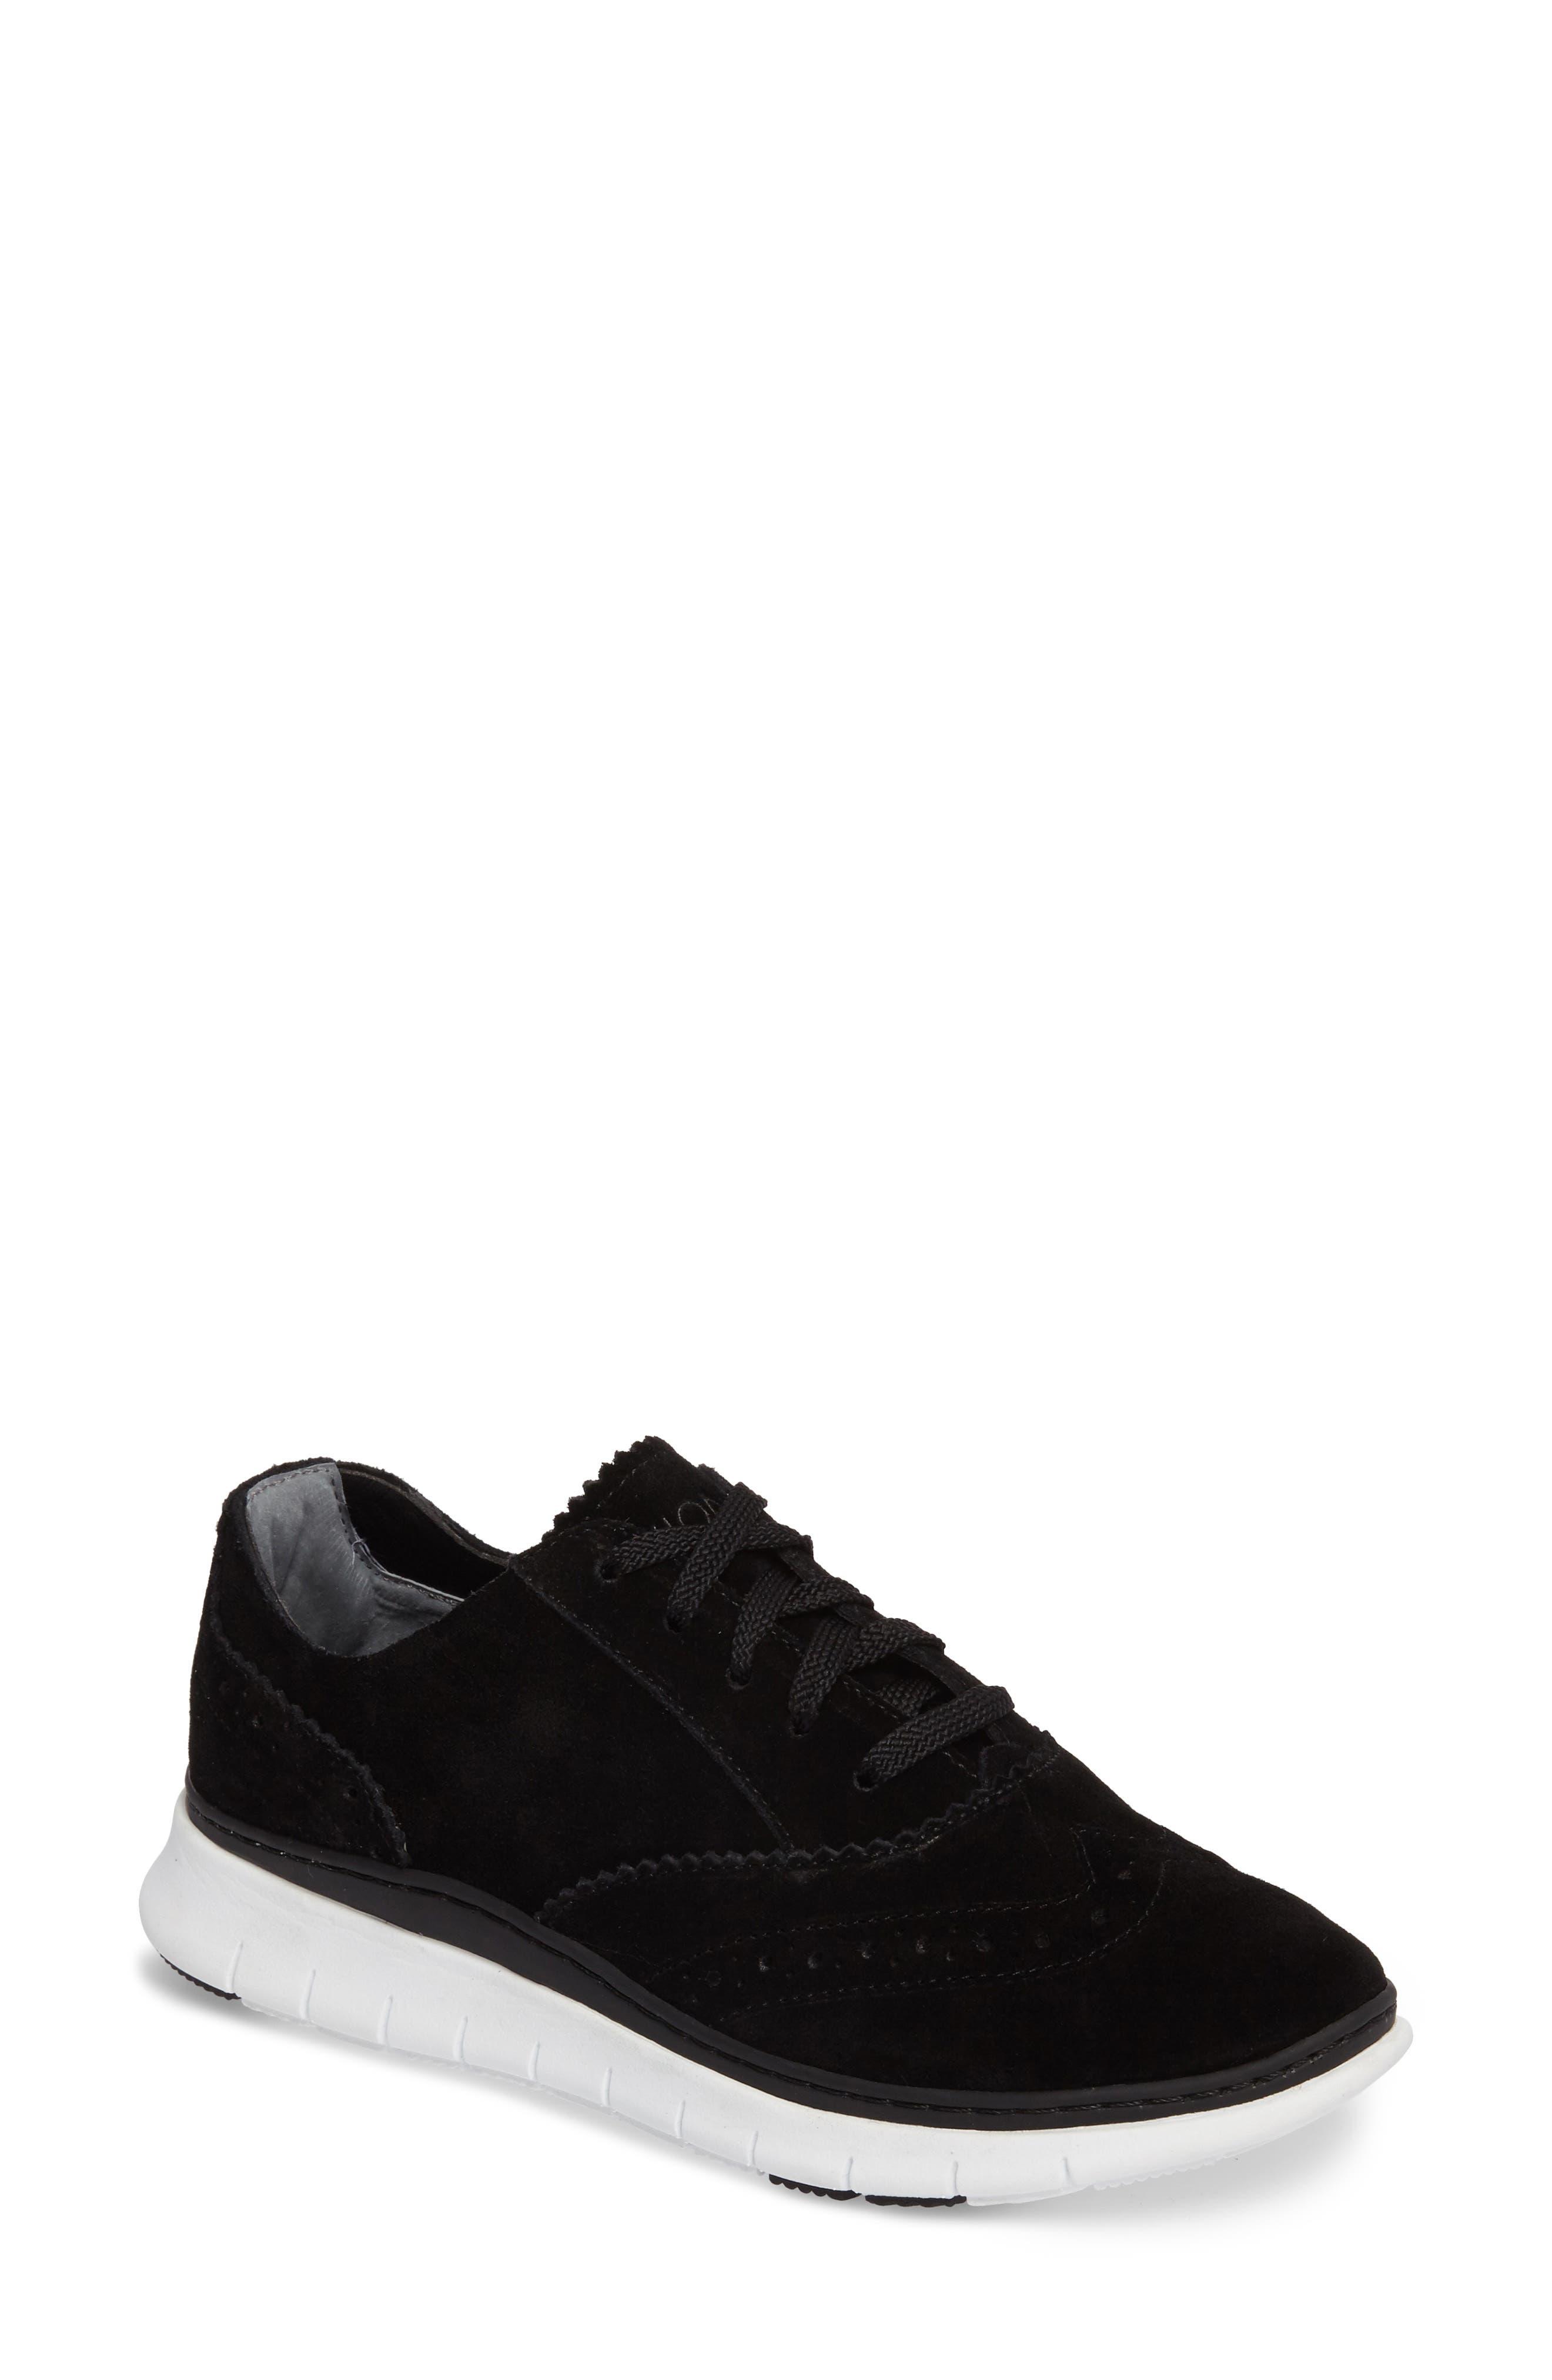 Kenley Sneaker,                             Main thumbnail 1, color,                             Black Suede